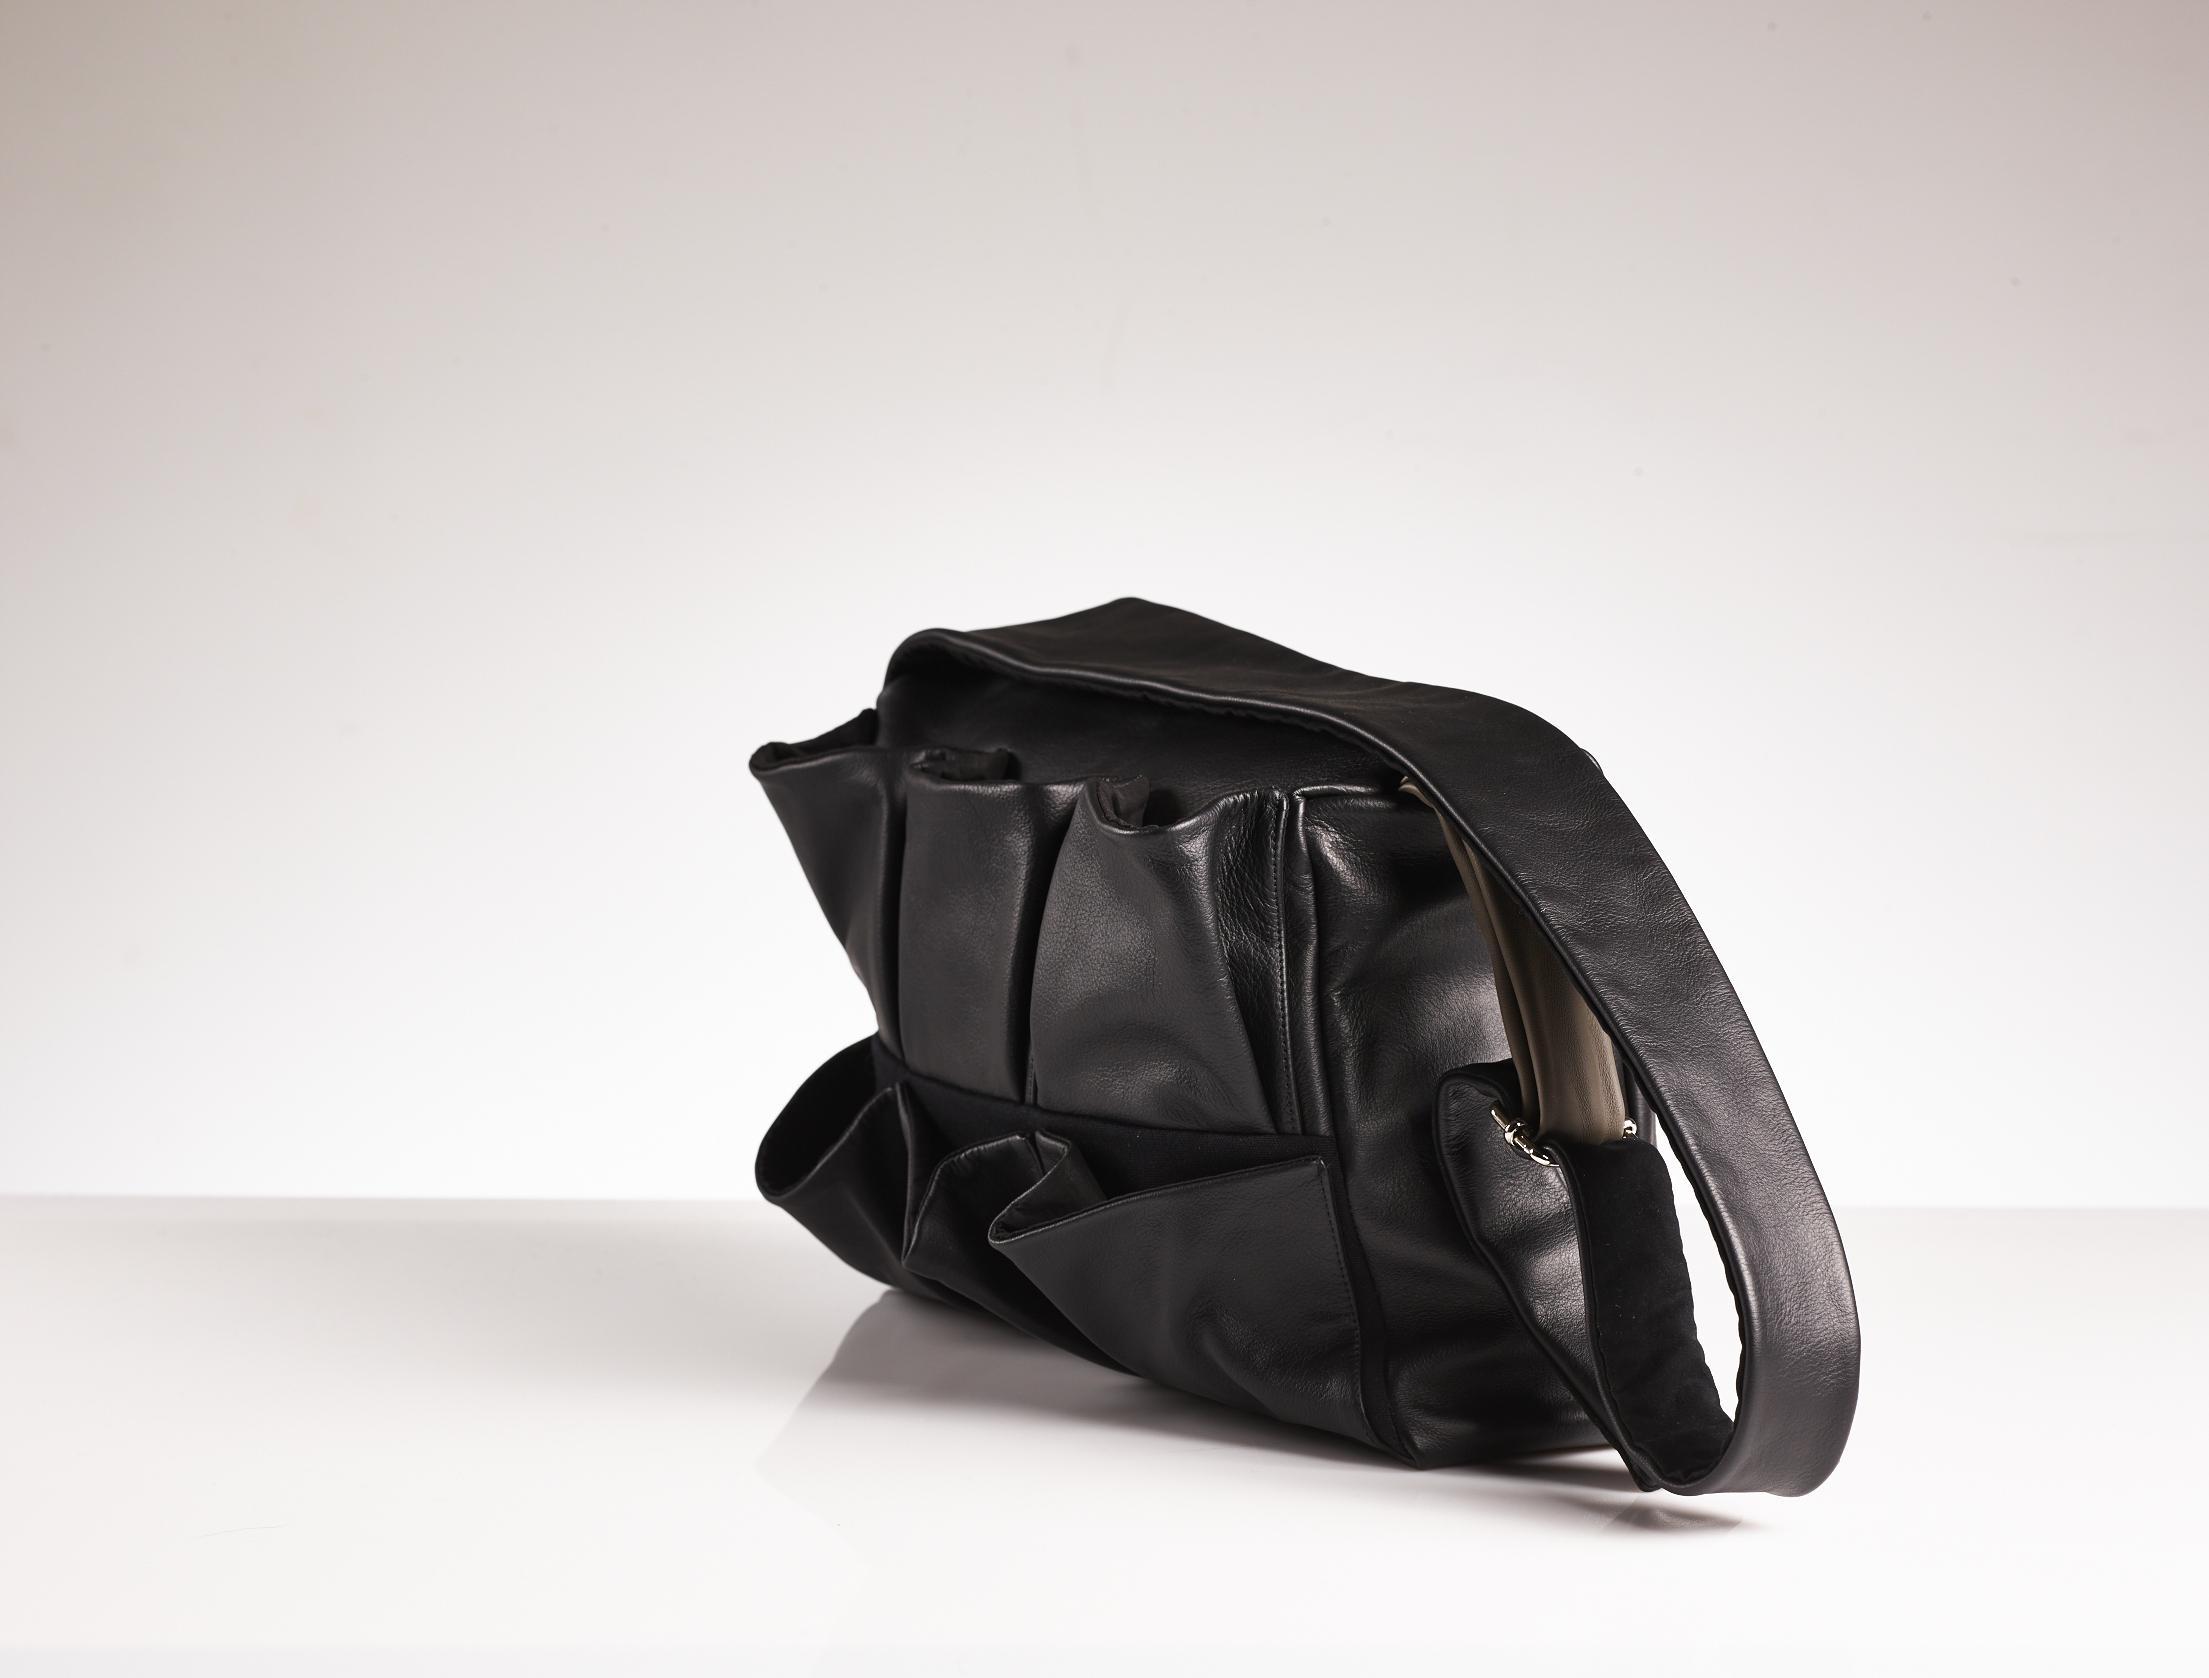 Strehlow handtasche_25990.jpg